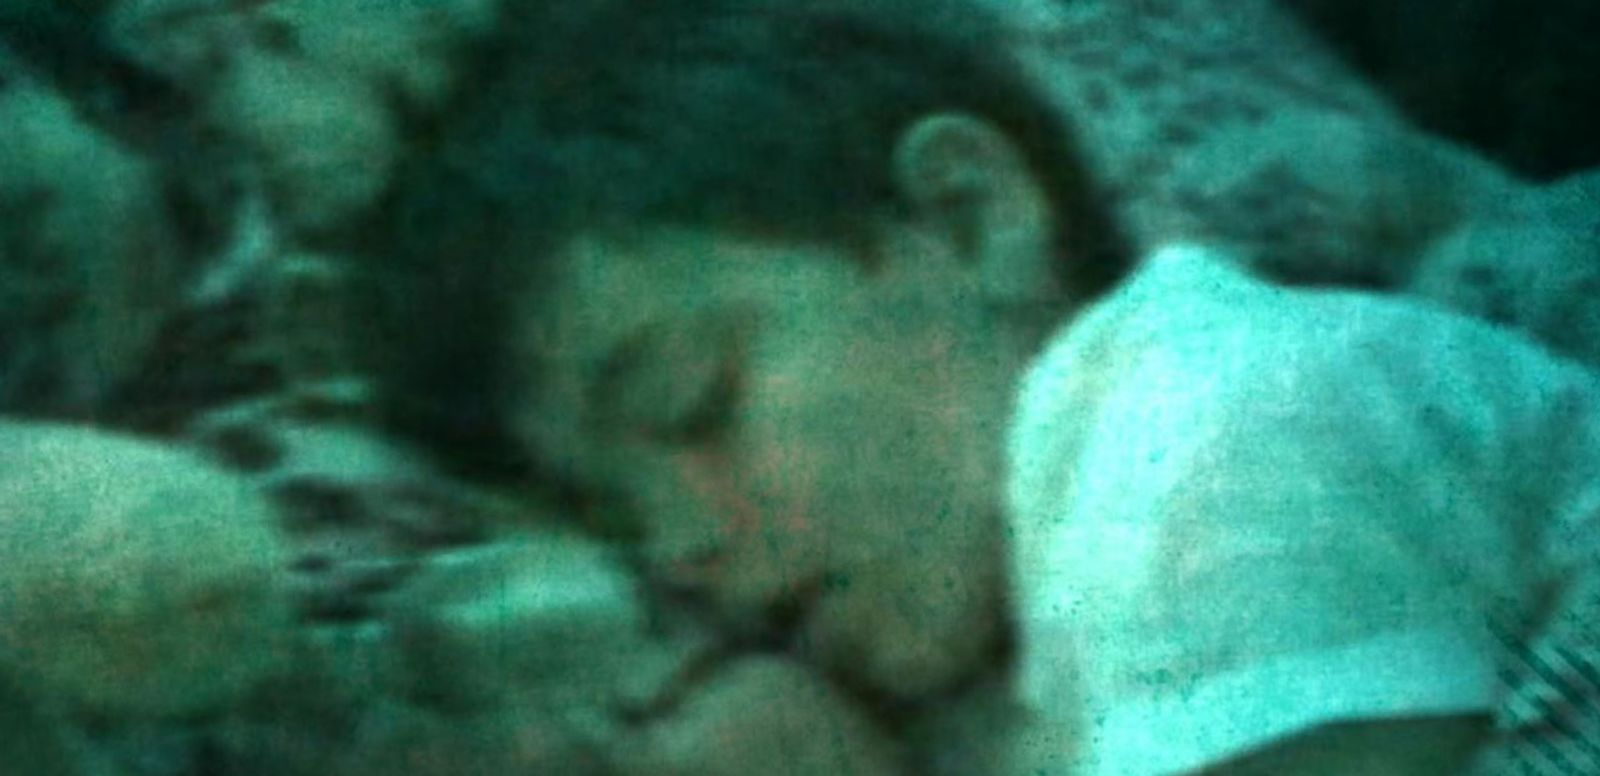 VIDEO: New Study Suggests Sleepwalking May be Genetic